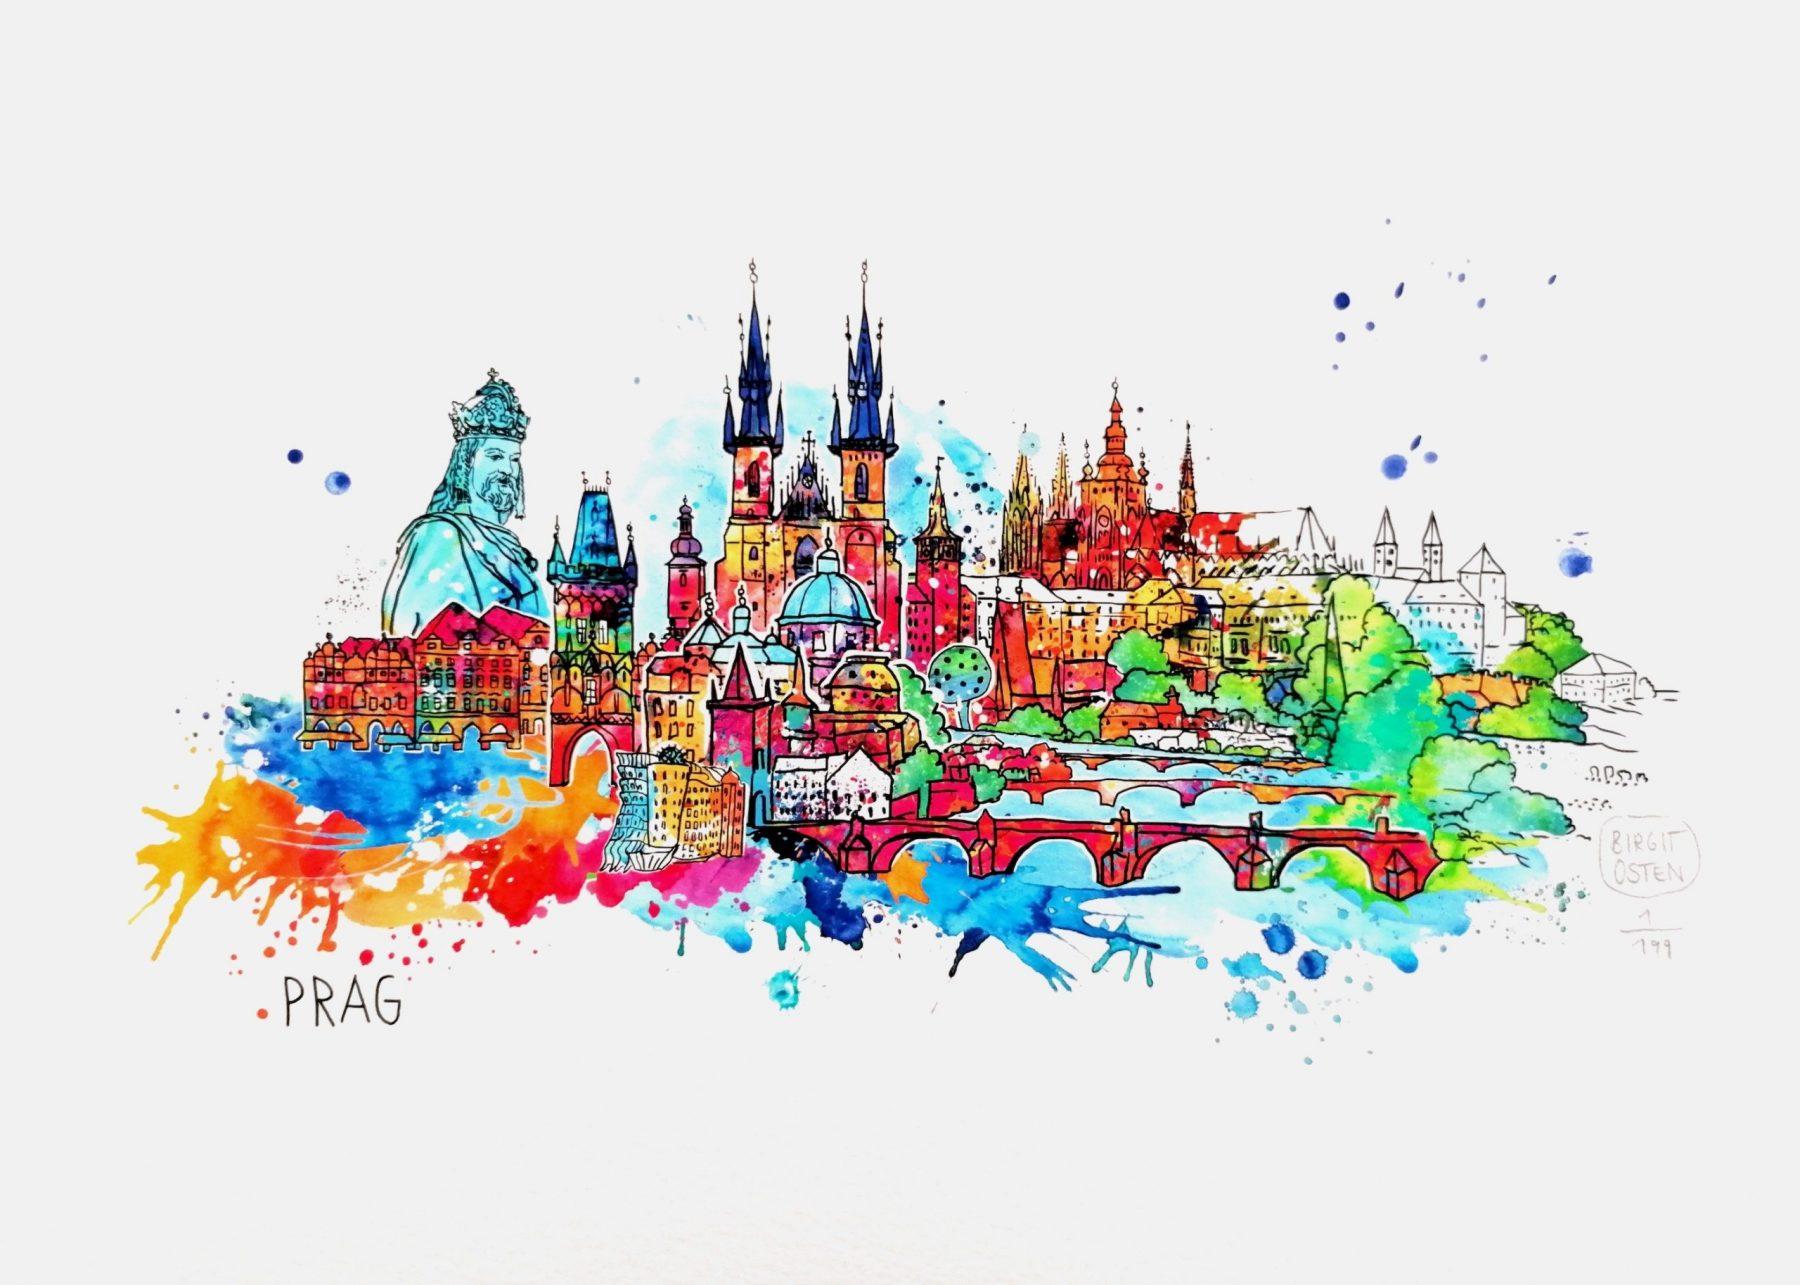 Prag - Osten, Birgit - k-BO94